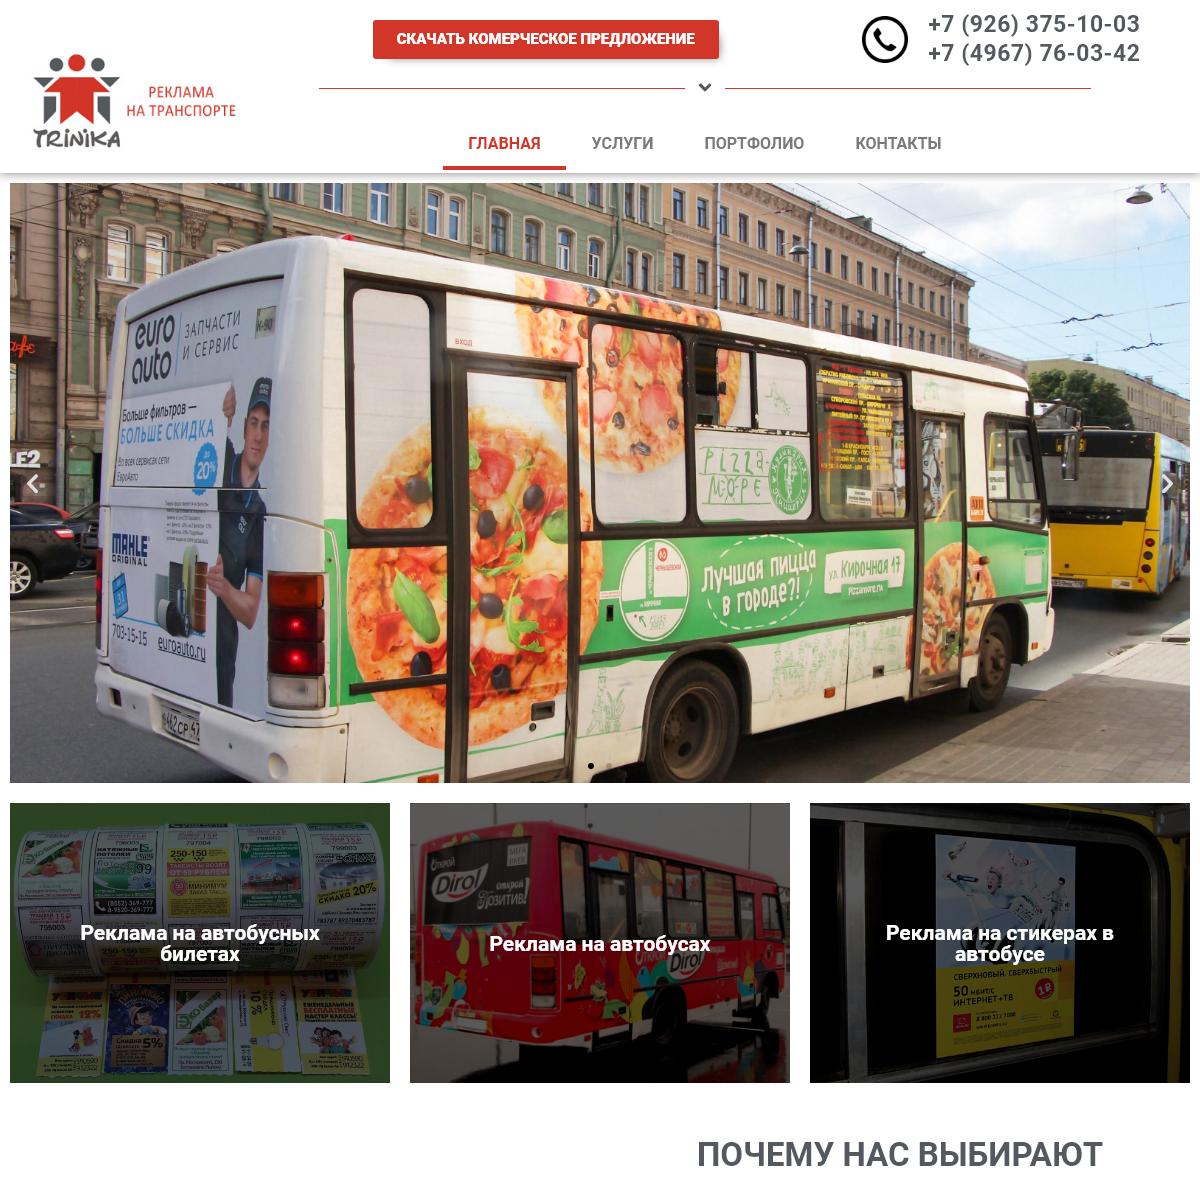 TRINIKA - Реклама на траспорте Серпухов!